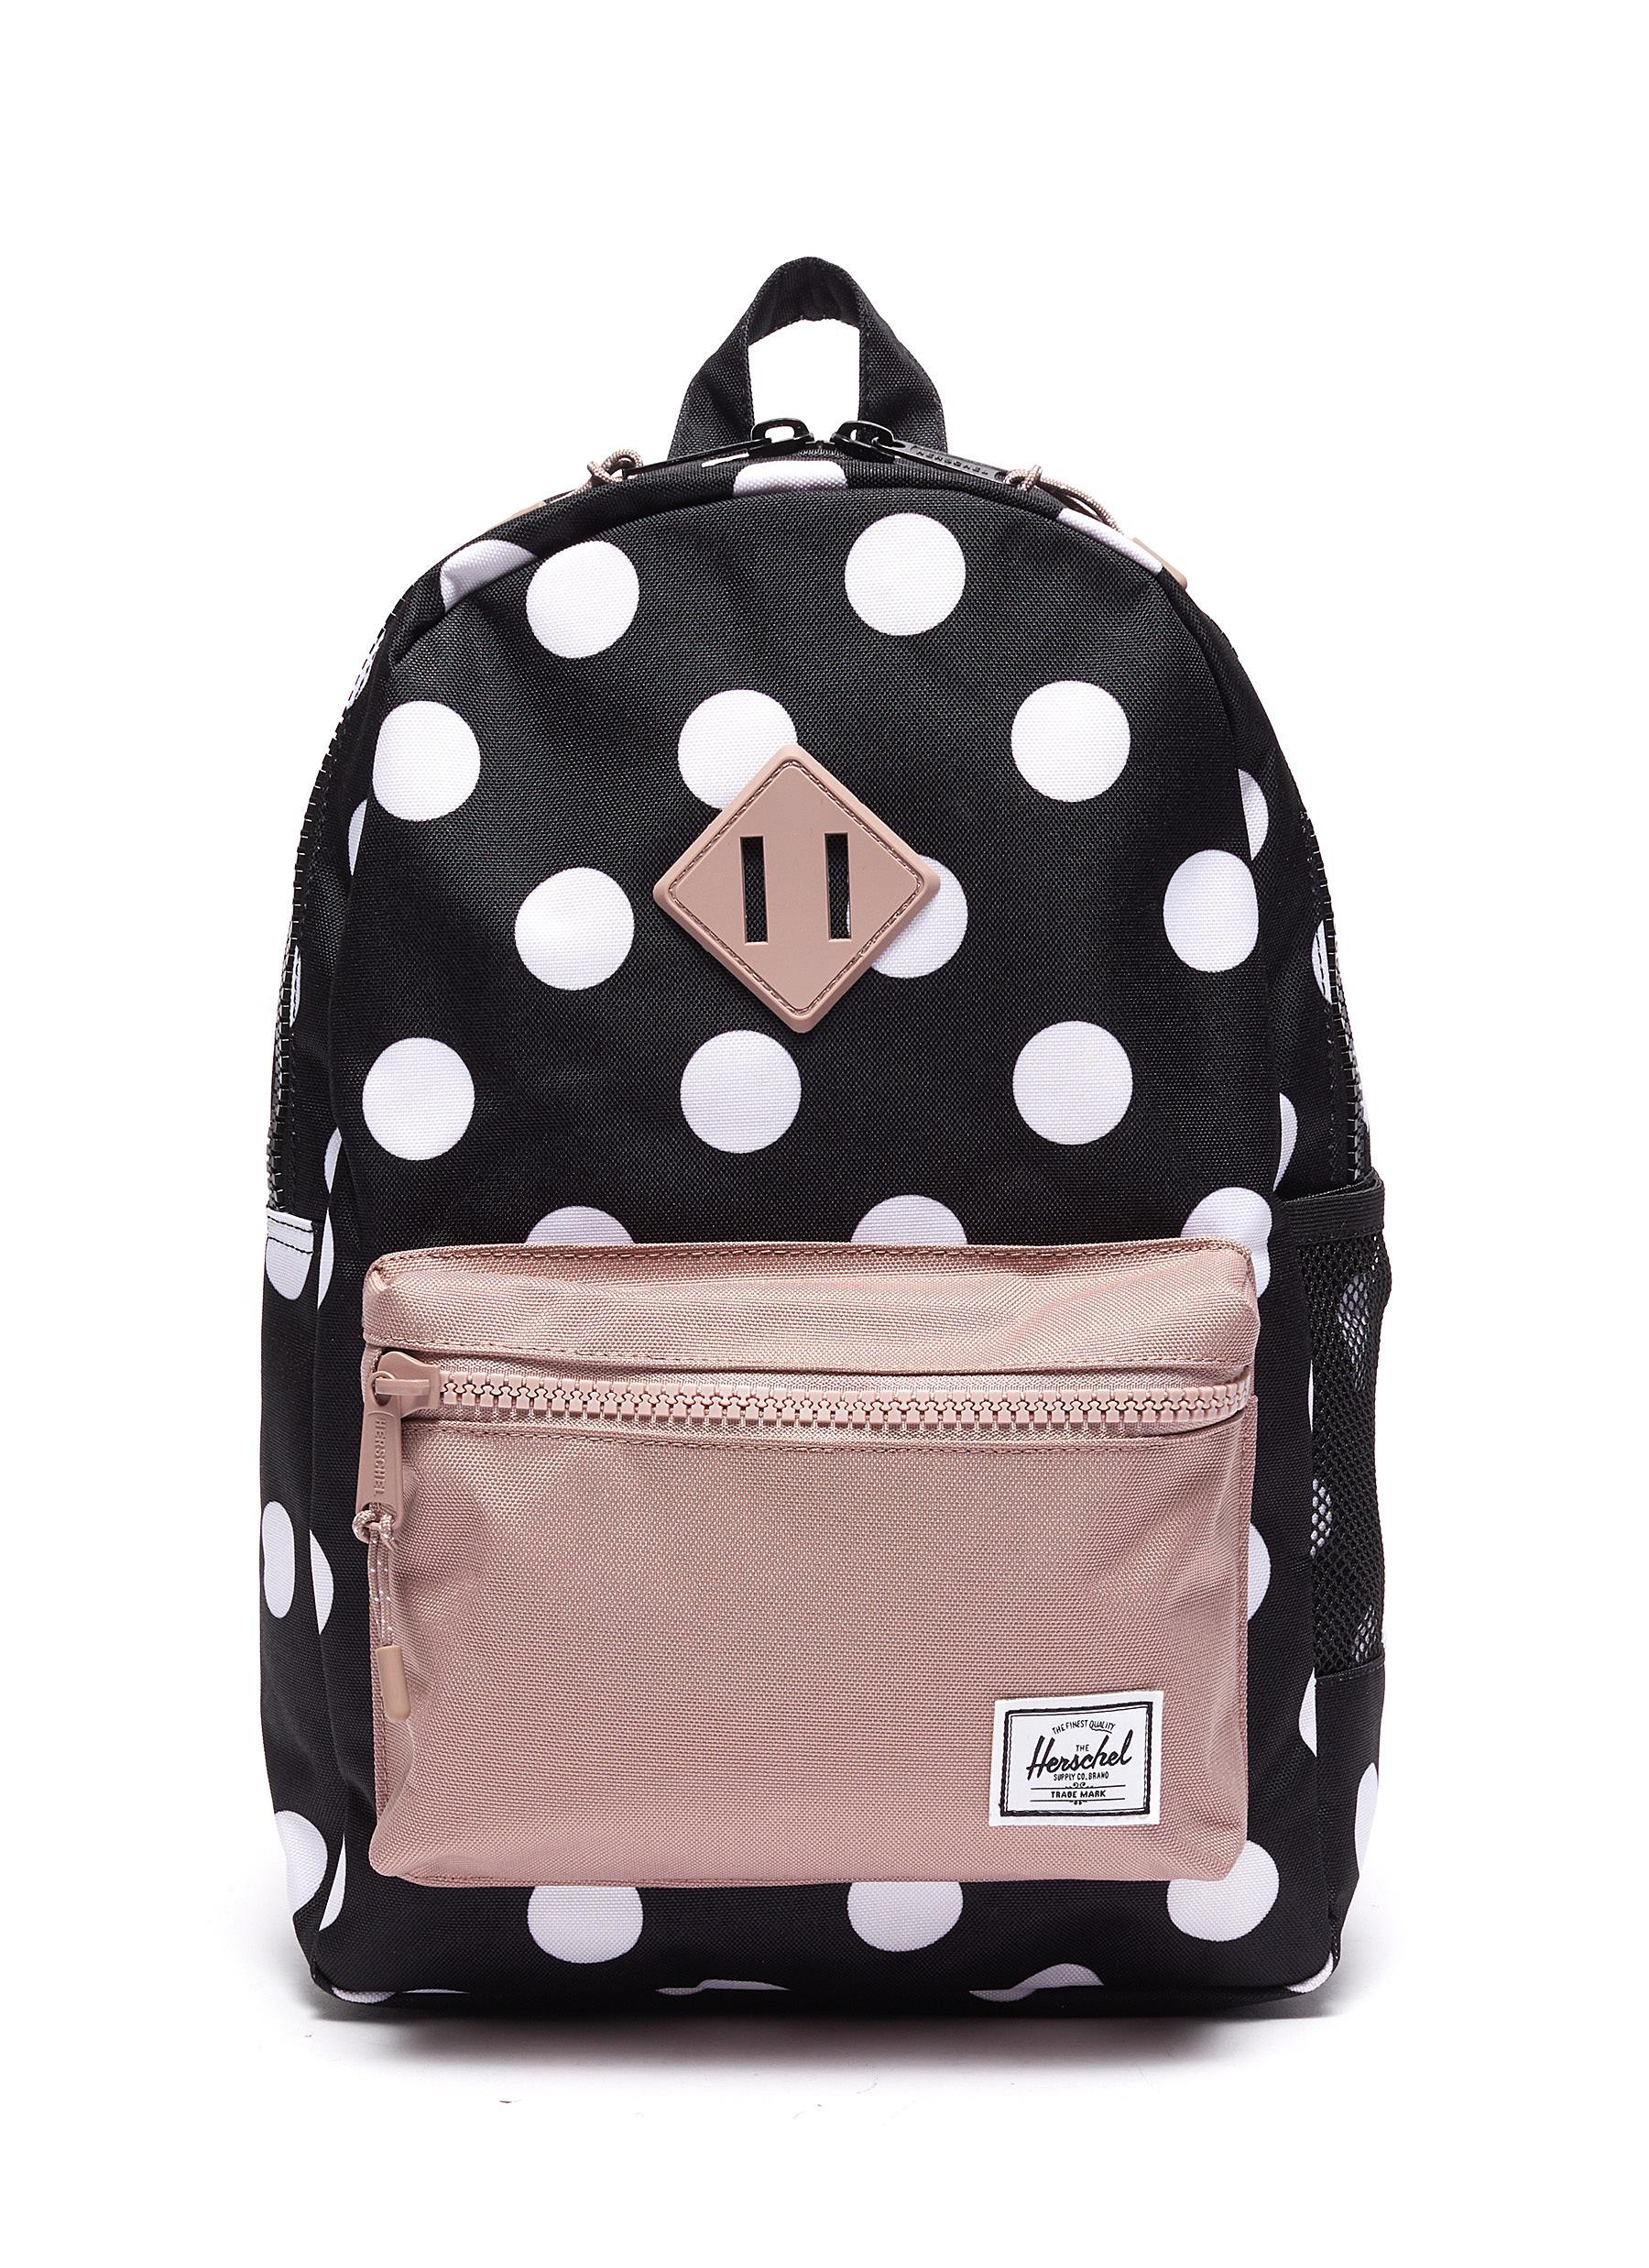 Heritage Youth' polka dot print canvas backpack - THE HERSCHEL SUPPLY CO. - Modalova